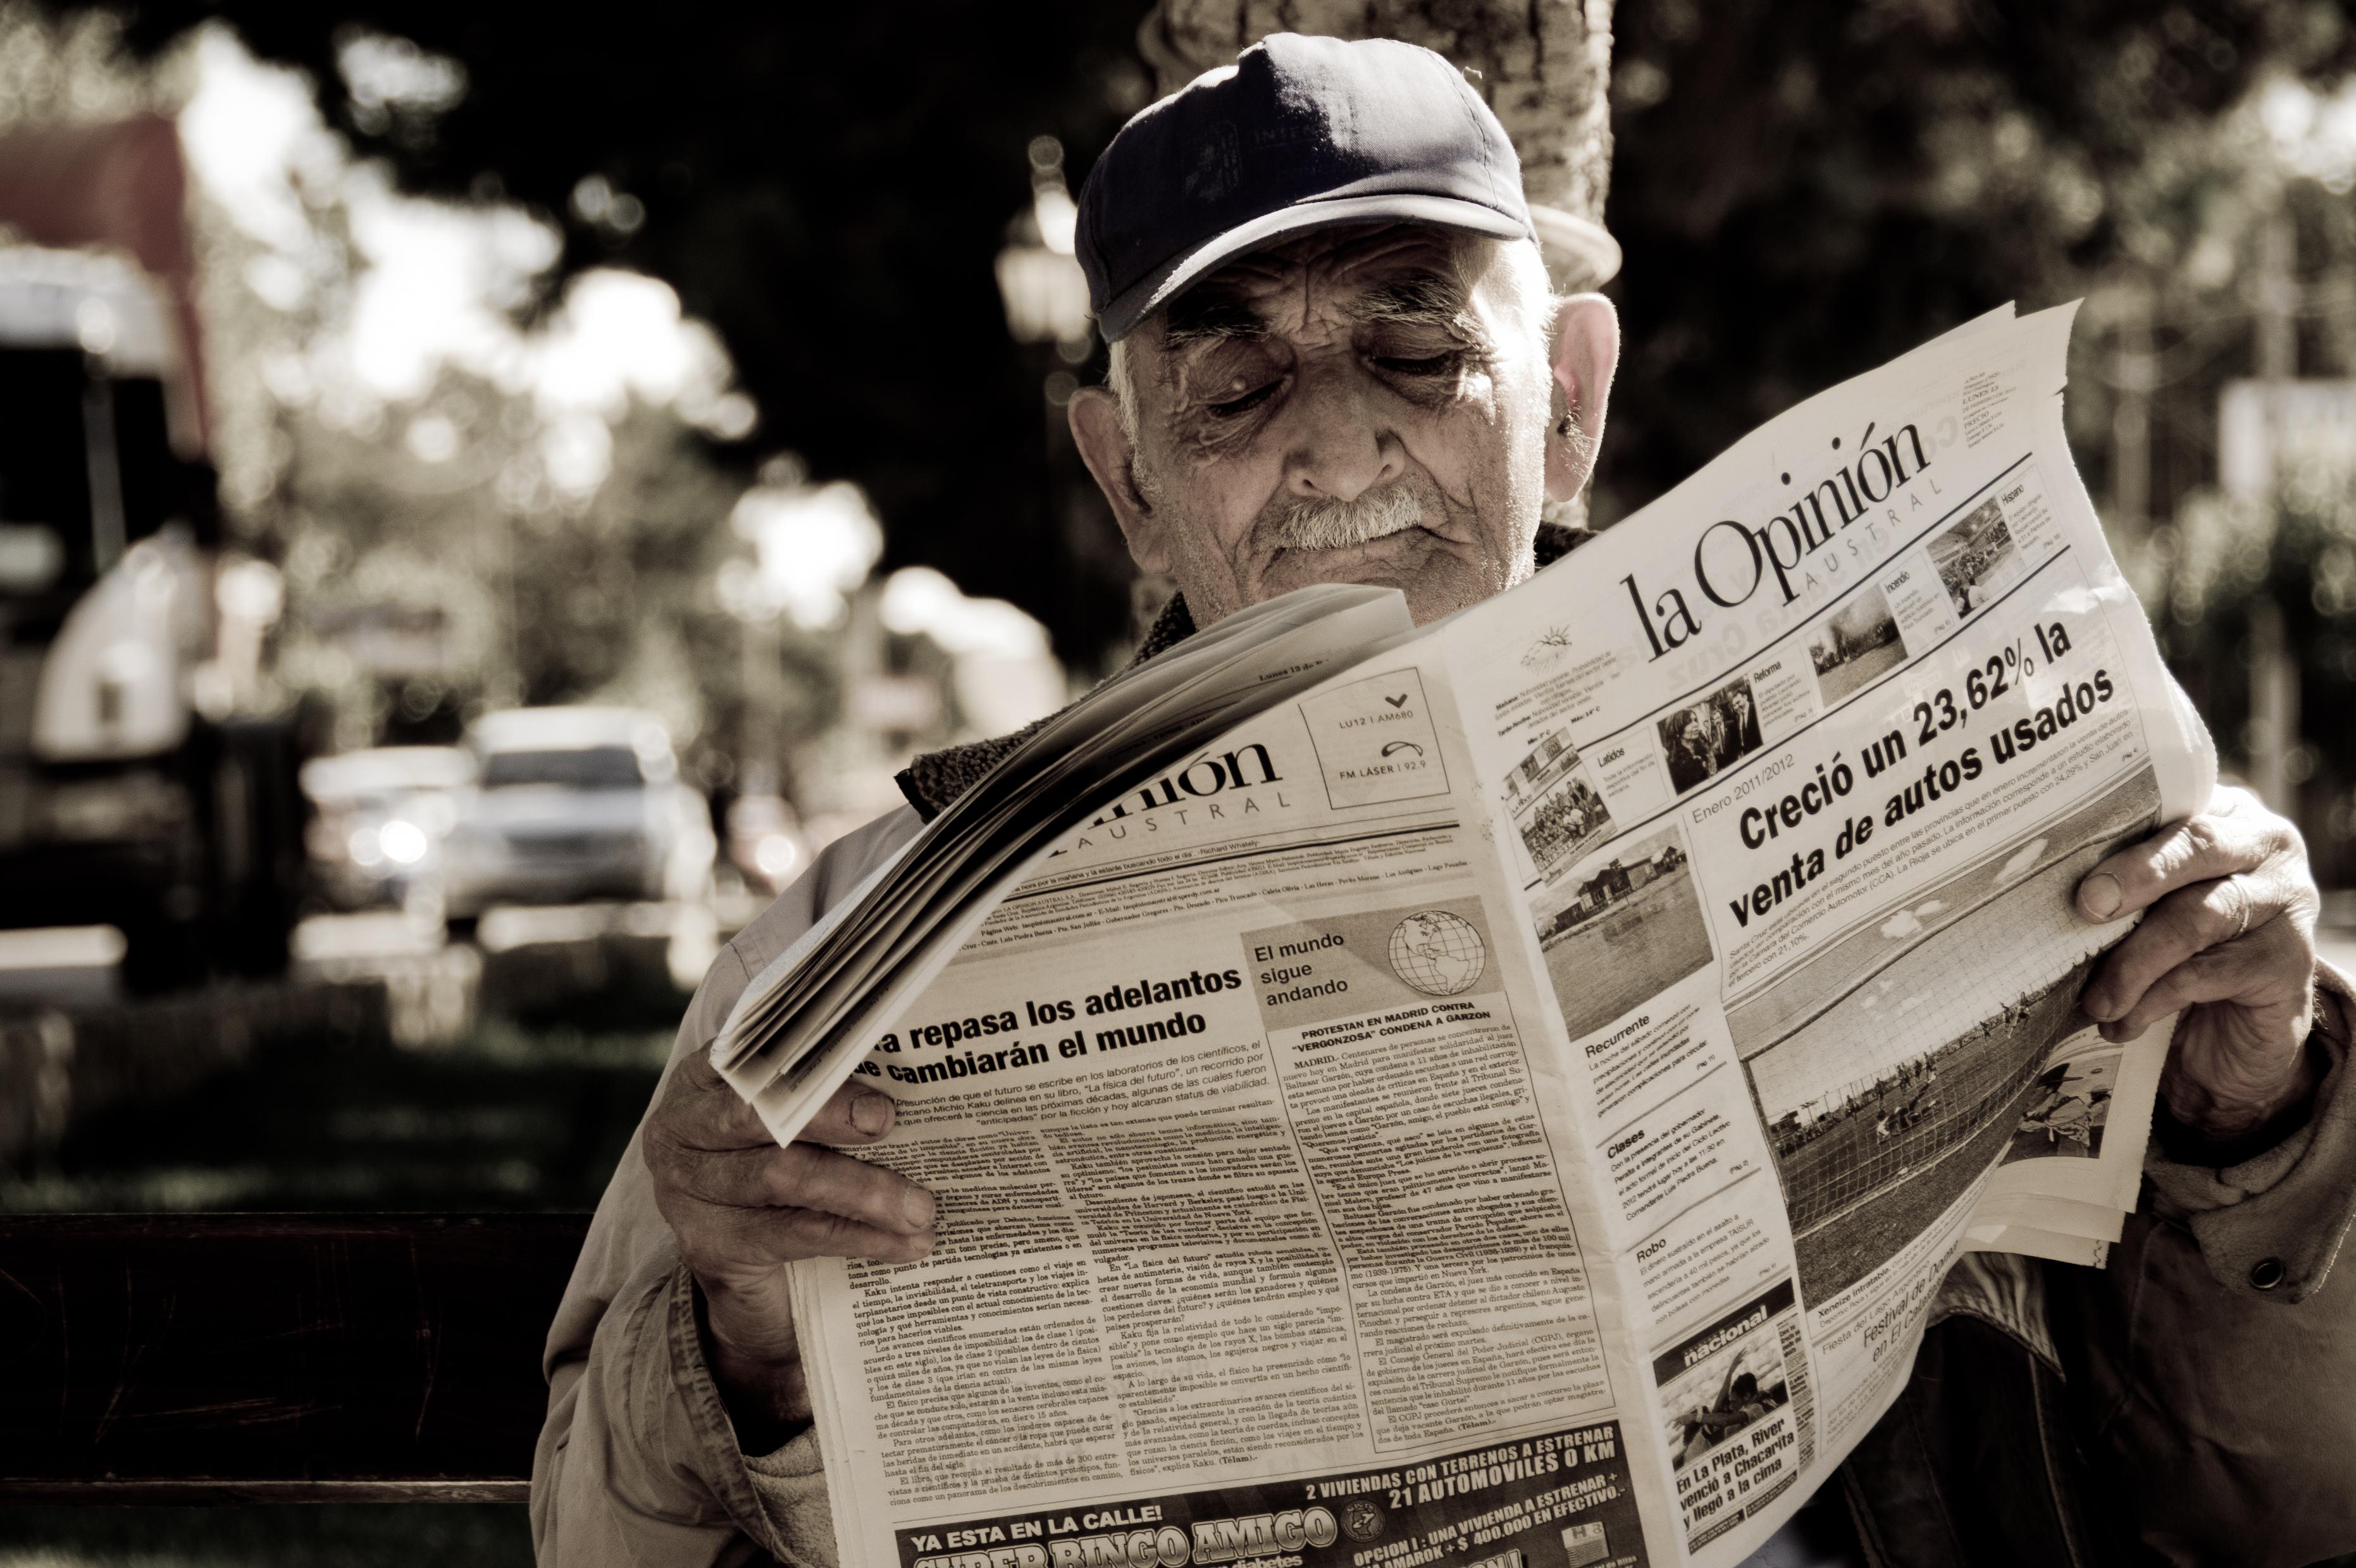 2012_newspaper_reader_Santa_Cruz_Argentina_7133646327